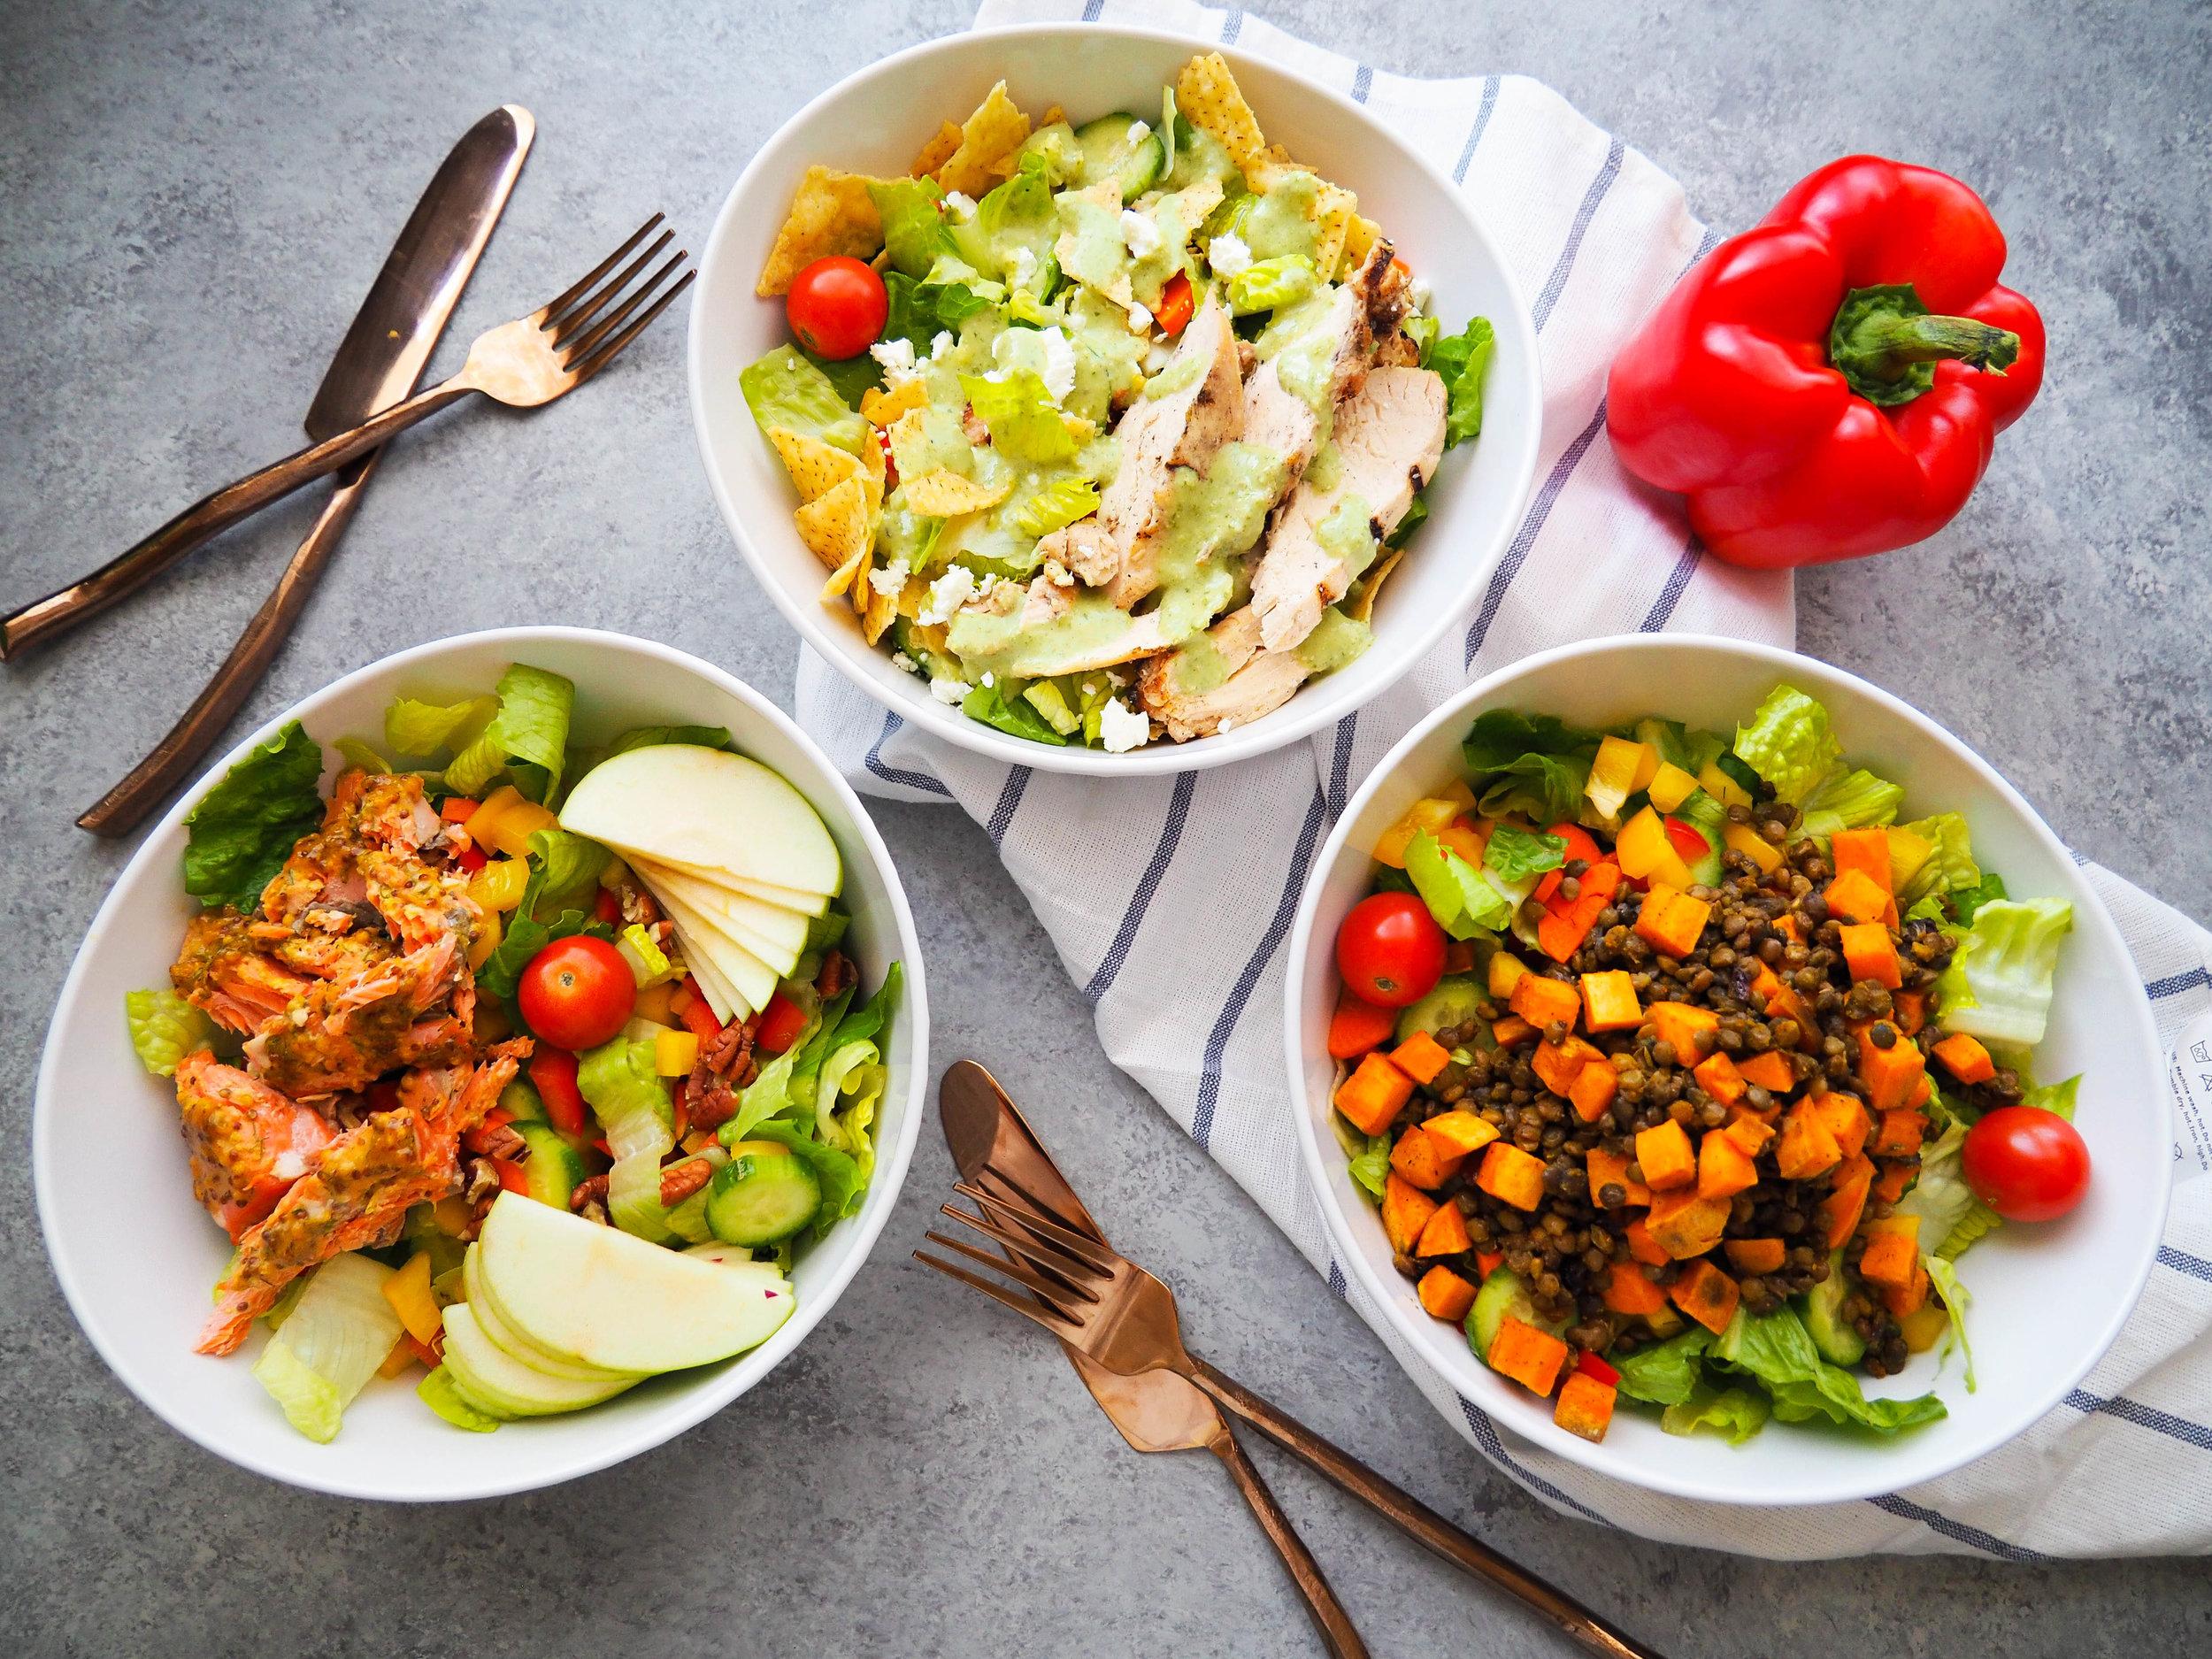 Crunchy Salad Mix + Three Easy Lunch Salads